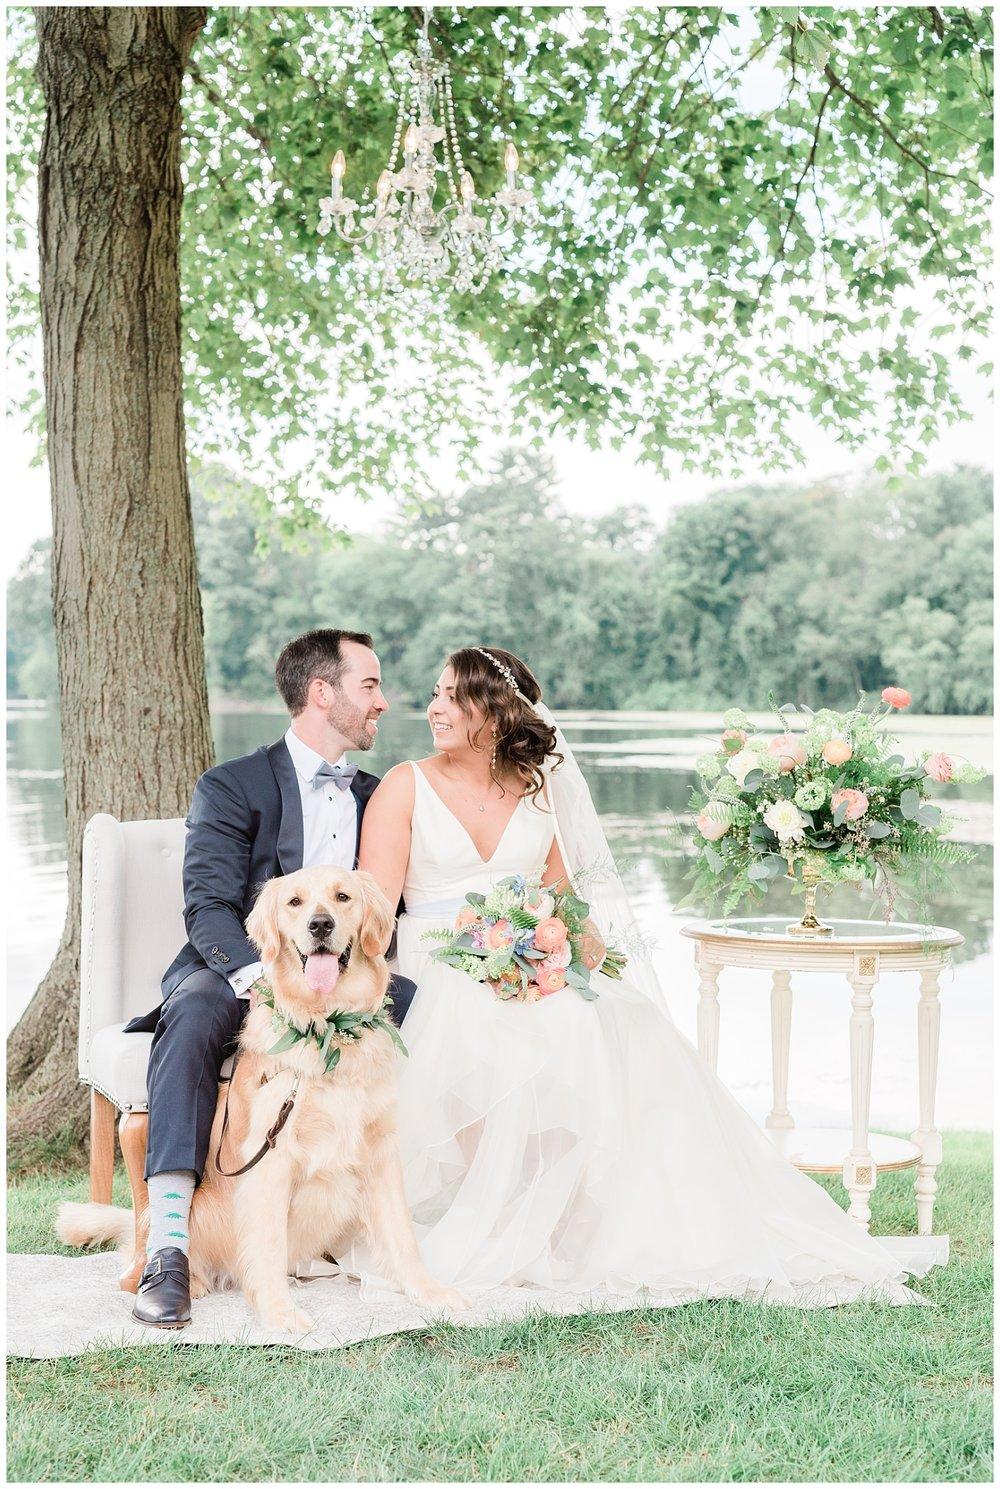 Indian-Trail-Club-Franklin-Lakes-NJ-Summer-Stylish-Wedding-Photographer-Photo-_0087.jpg